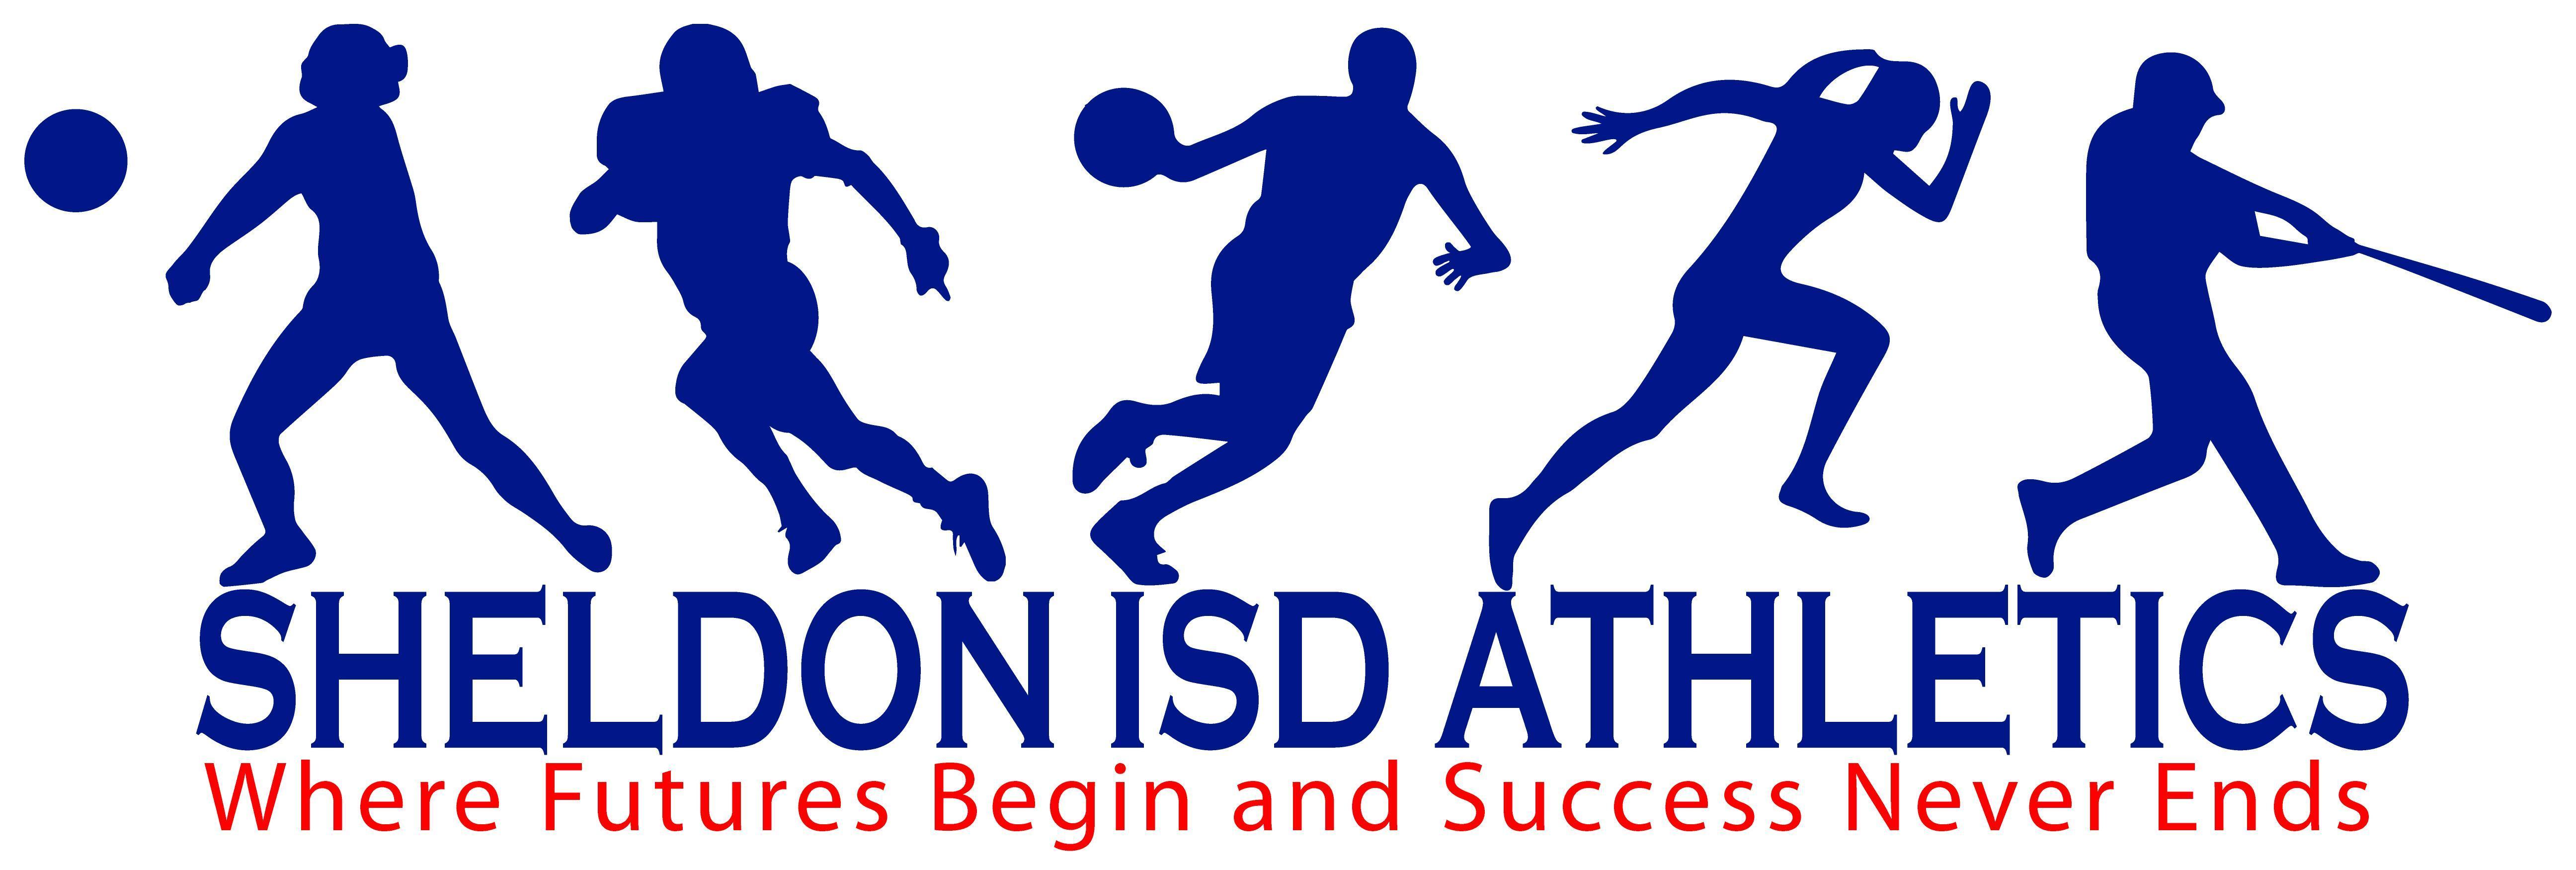 Athletics Spotlight Image